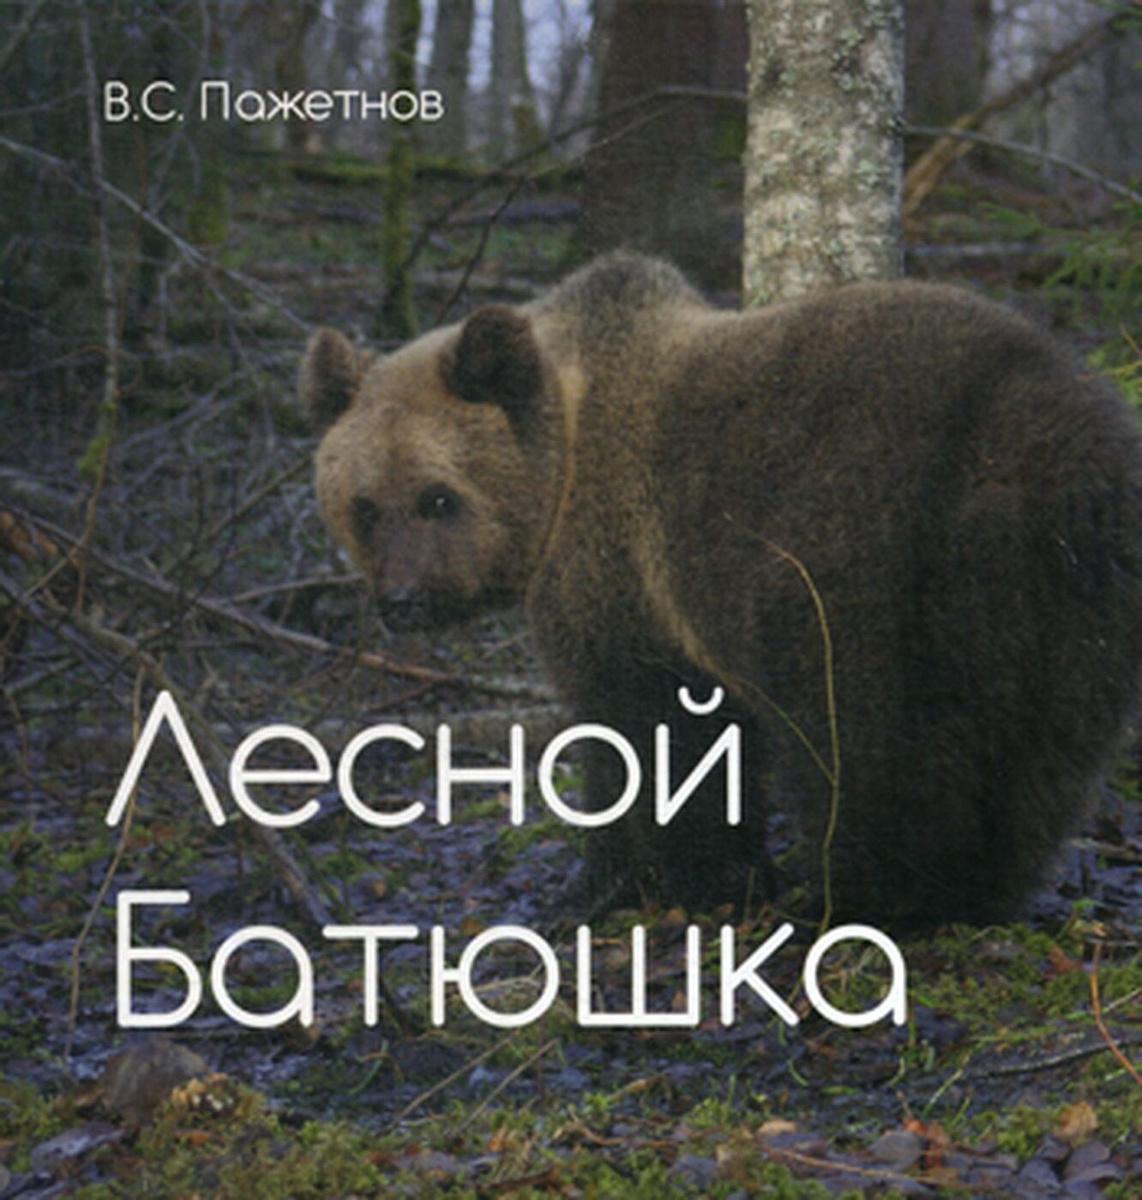 https://cdn1.ozone.ru/s3/multimedia-g/c1200/6009486412.jpg